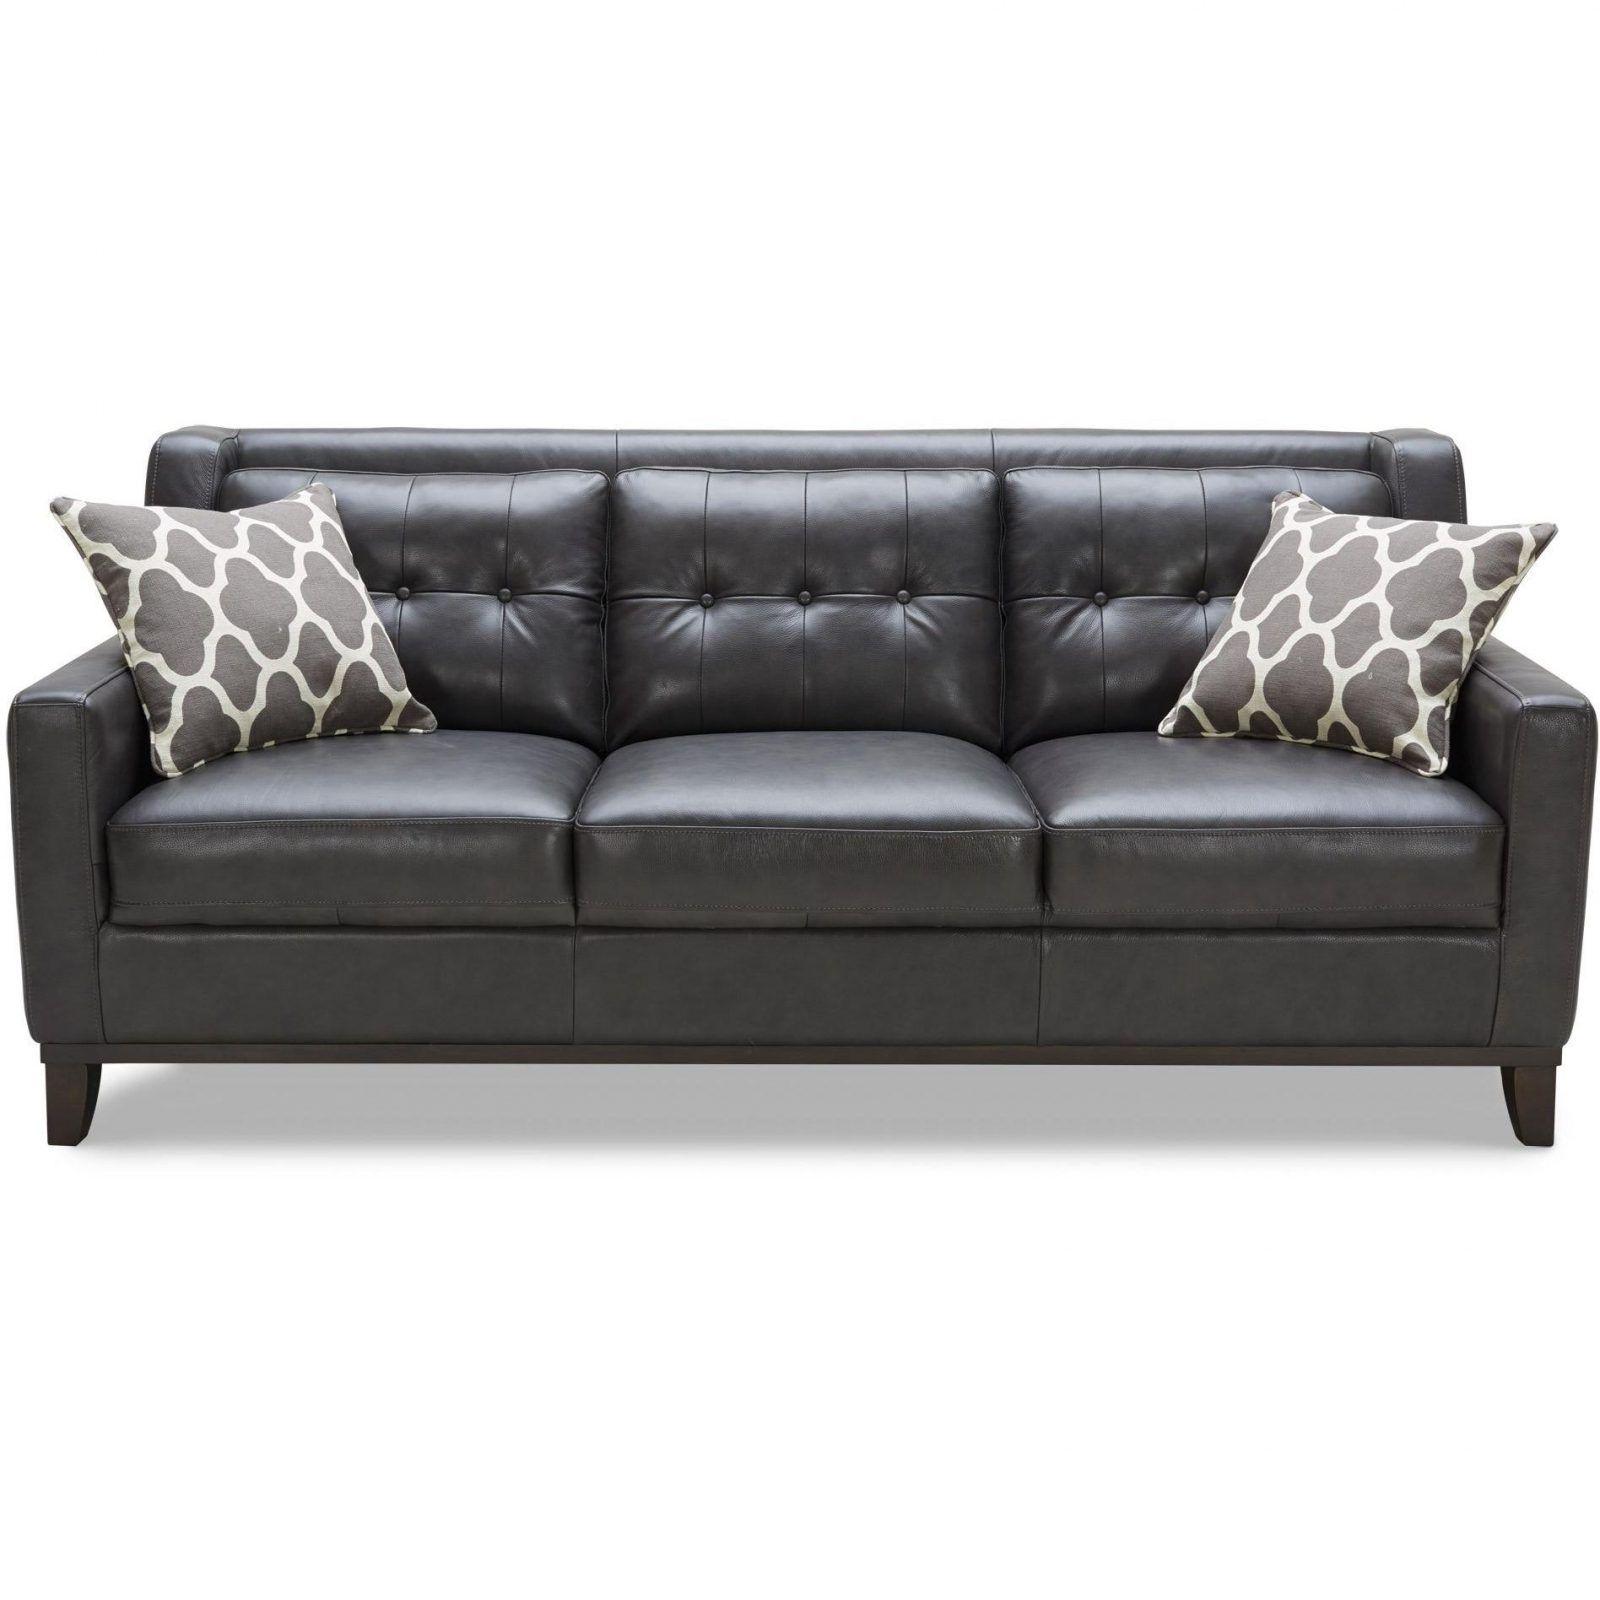 Halcyon Leather Sofa Furniture Village Grey Leather Sofa